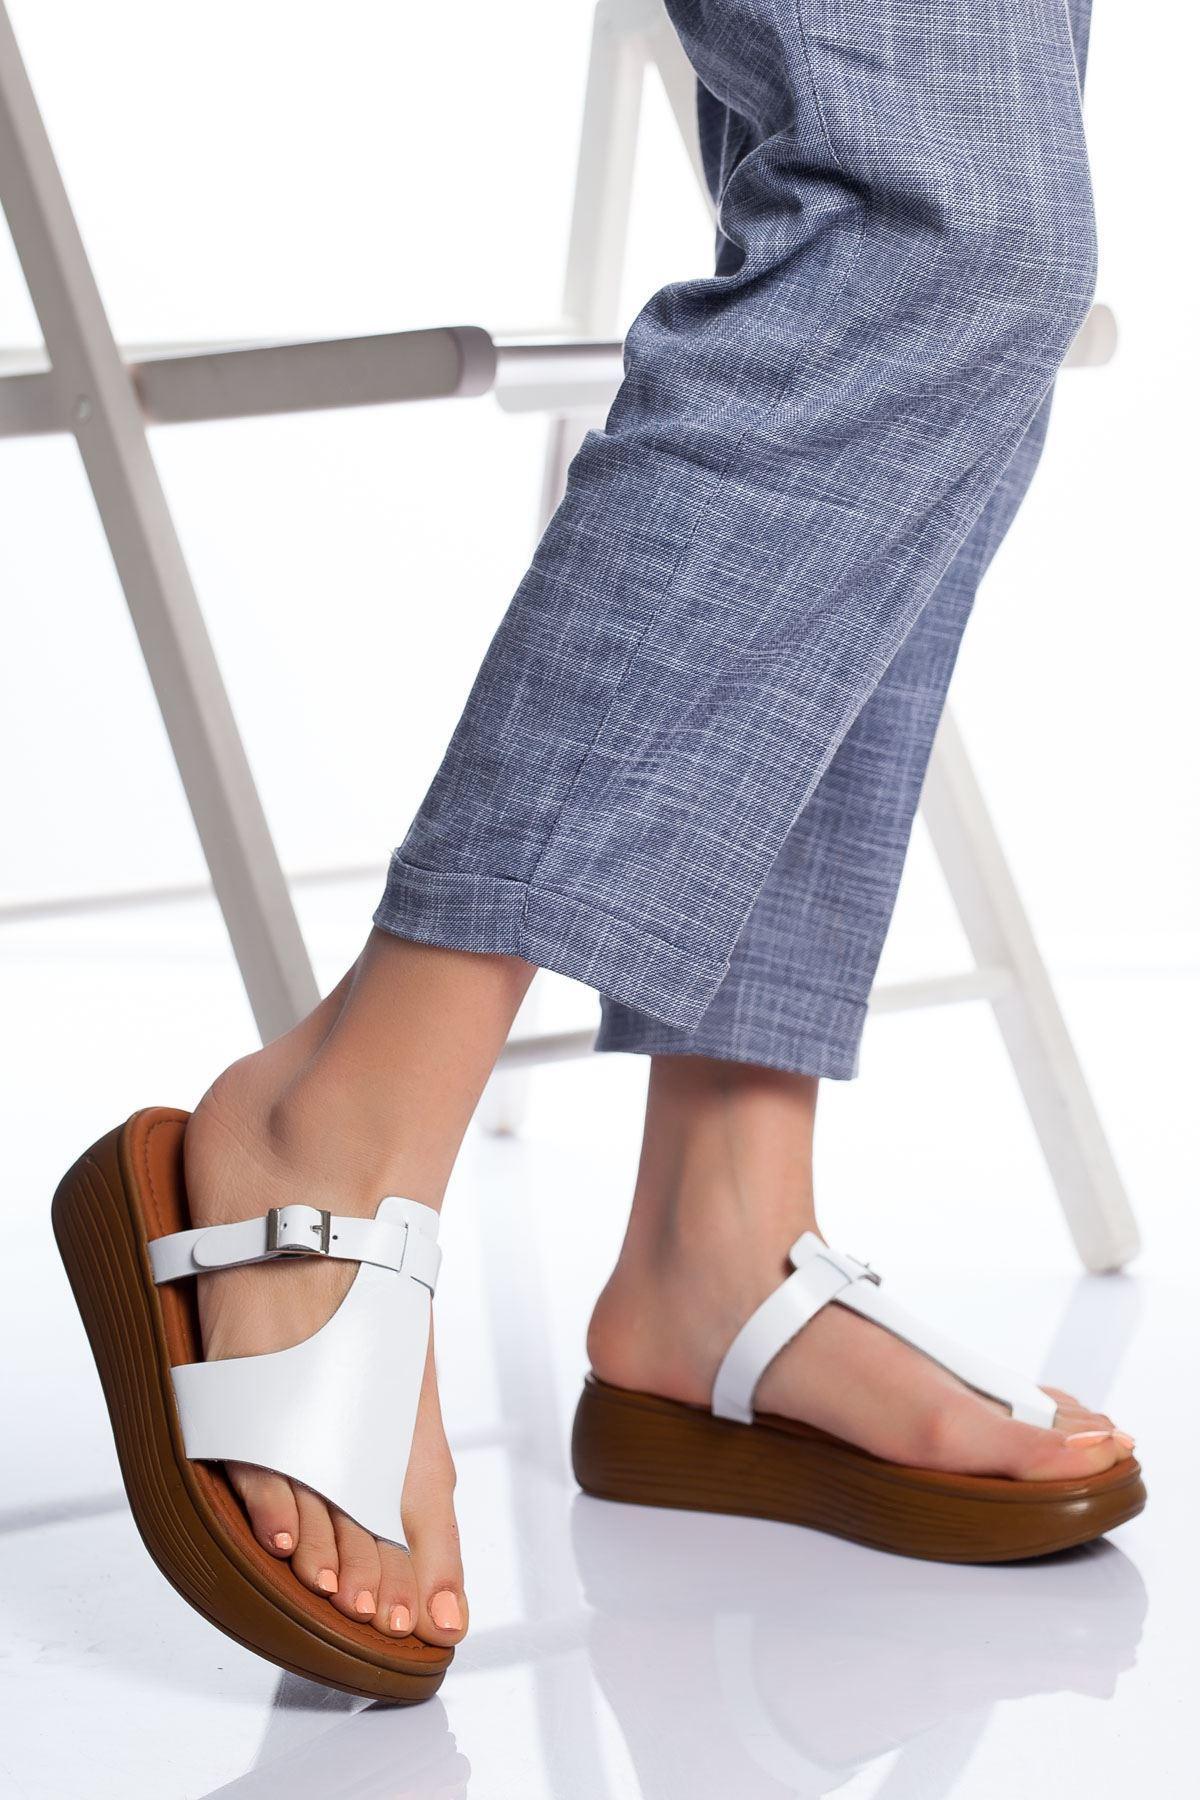 Talia Hakiki Deri Bayan Sandalet Beyaz